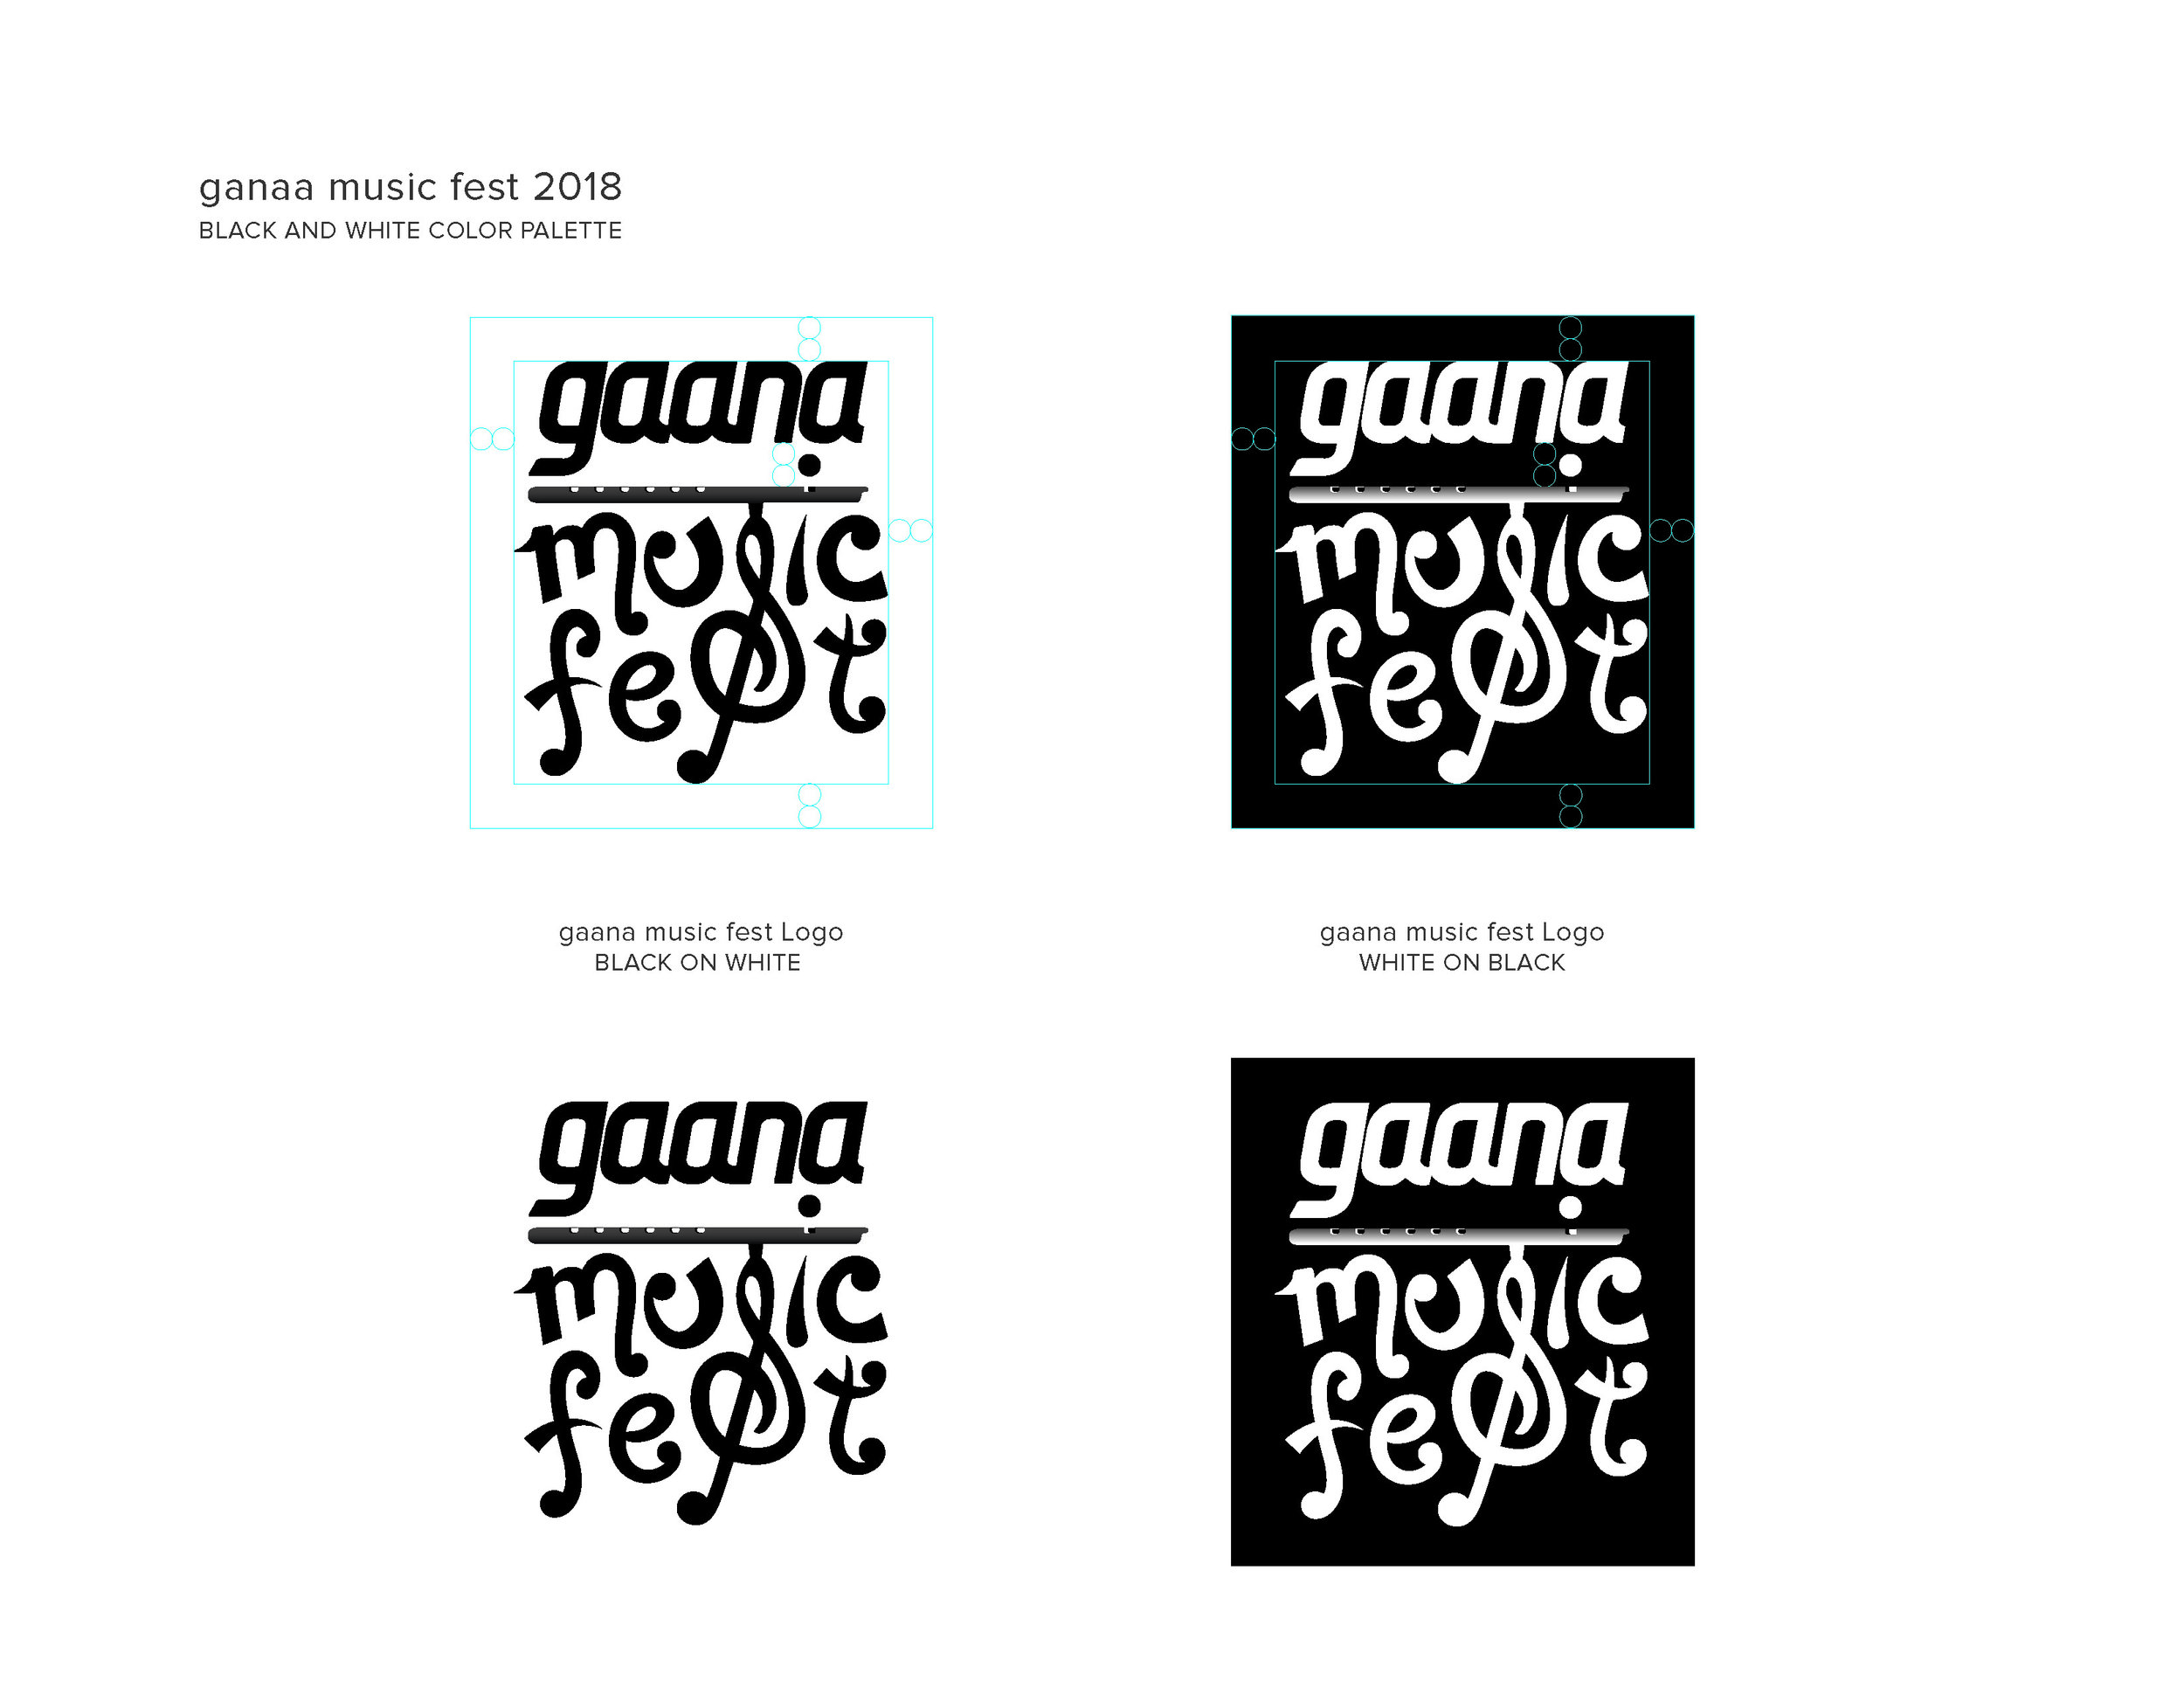 GaanaMusicFest2018_BRANDFINALs_Page_1.jpg